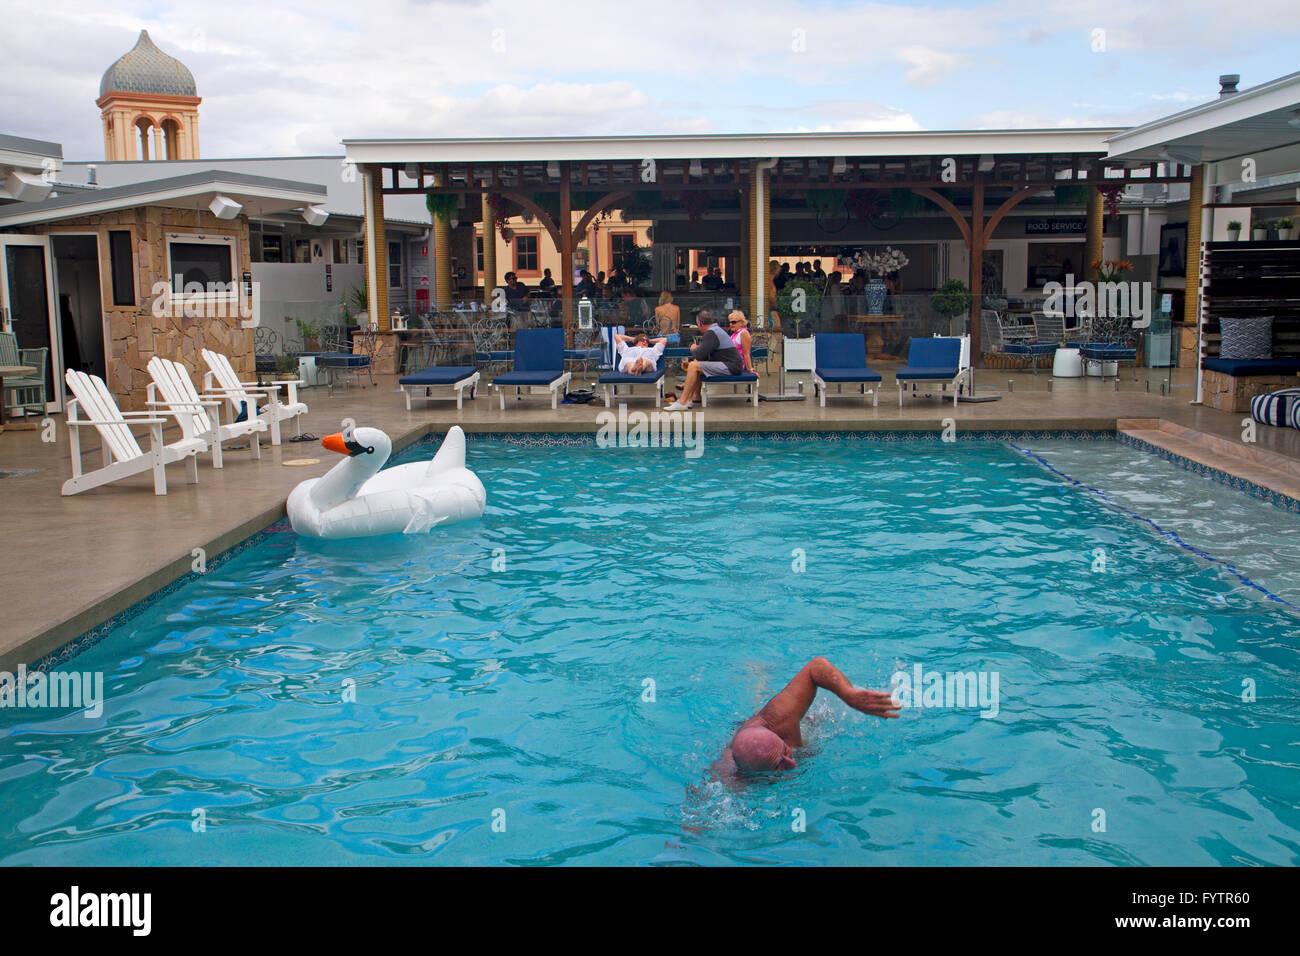 Swimming Pool At Rambutan Townsville Hostel Stock Photo